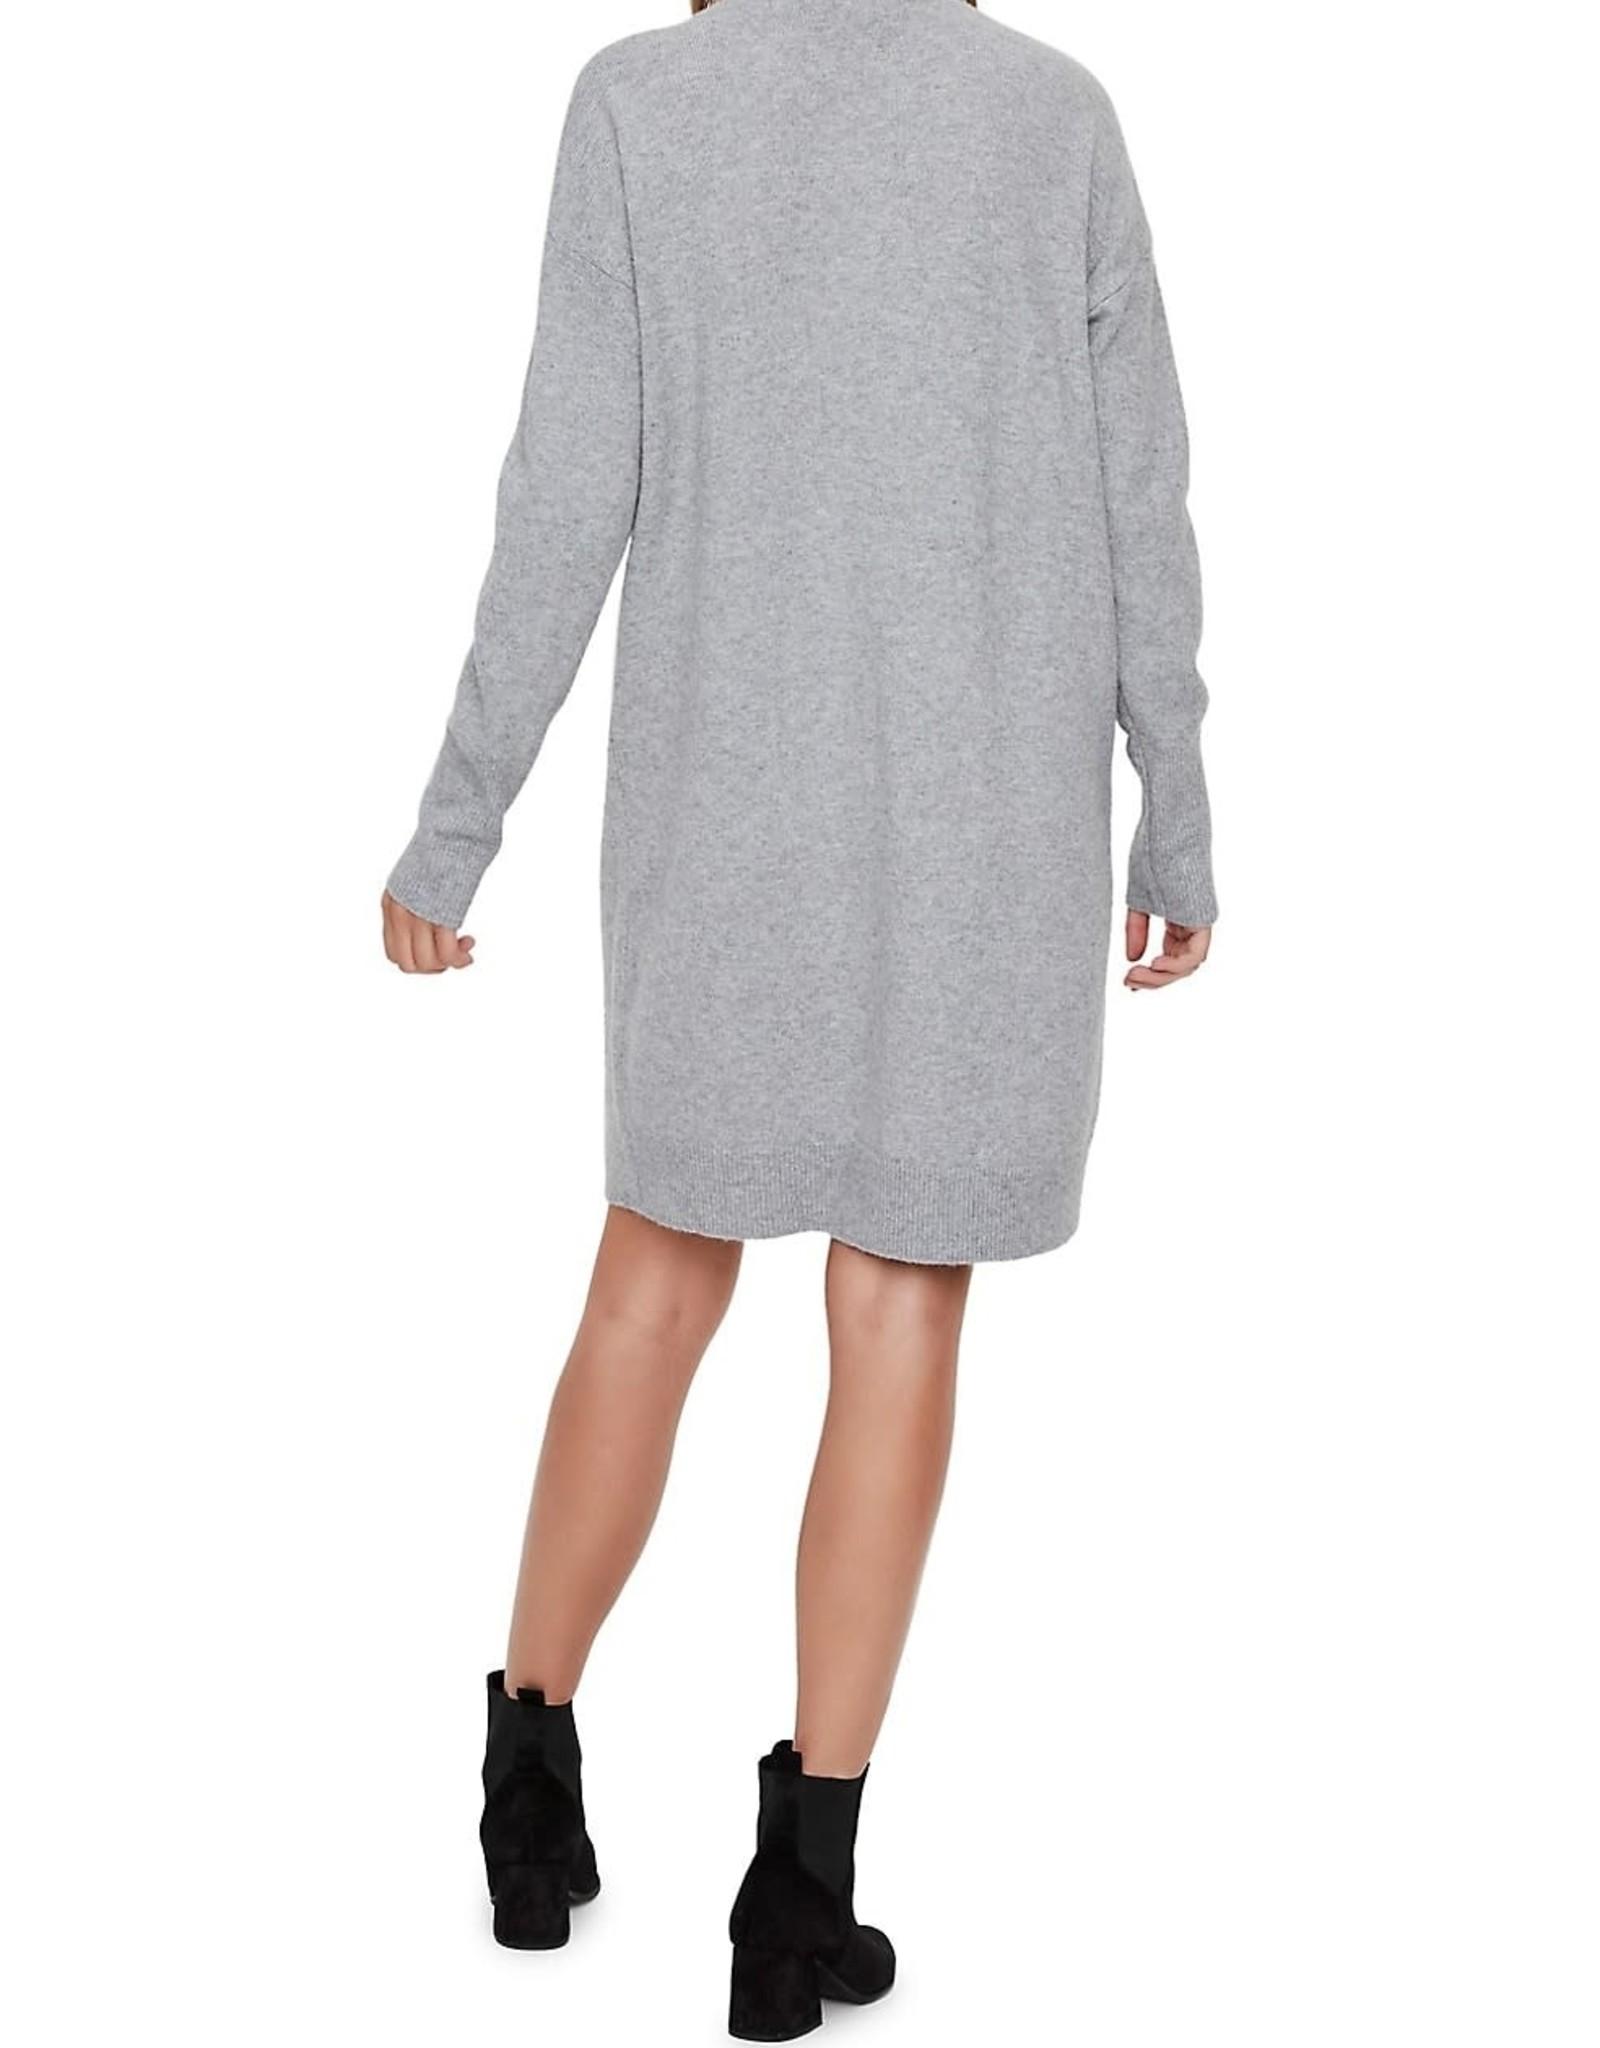 VERA MODA Brilliant LS Roll-Neck Dress